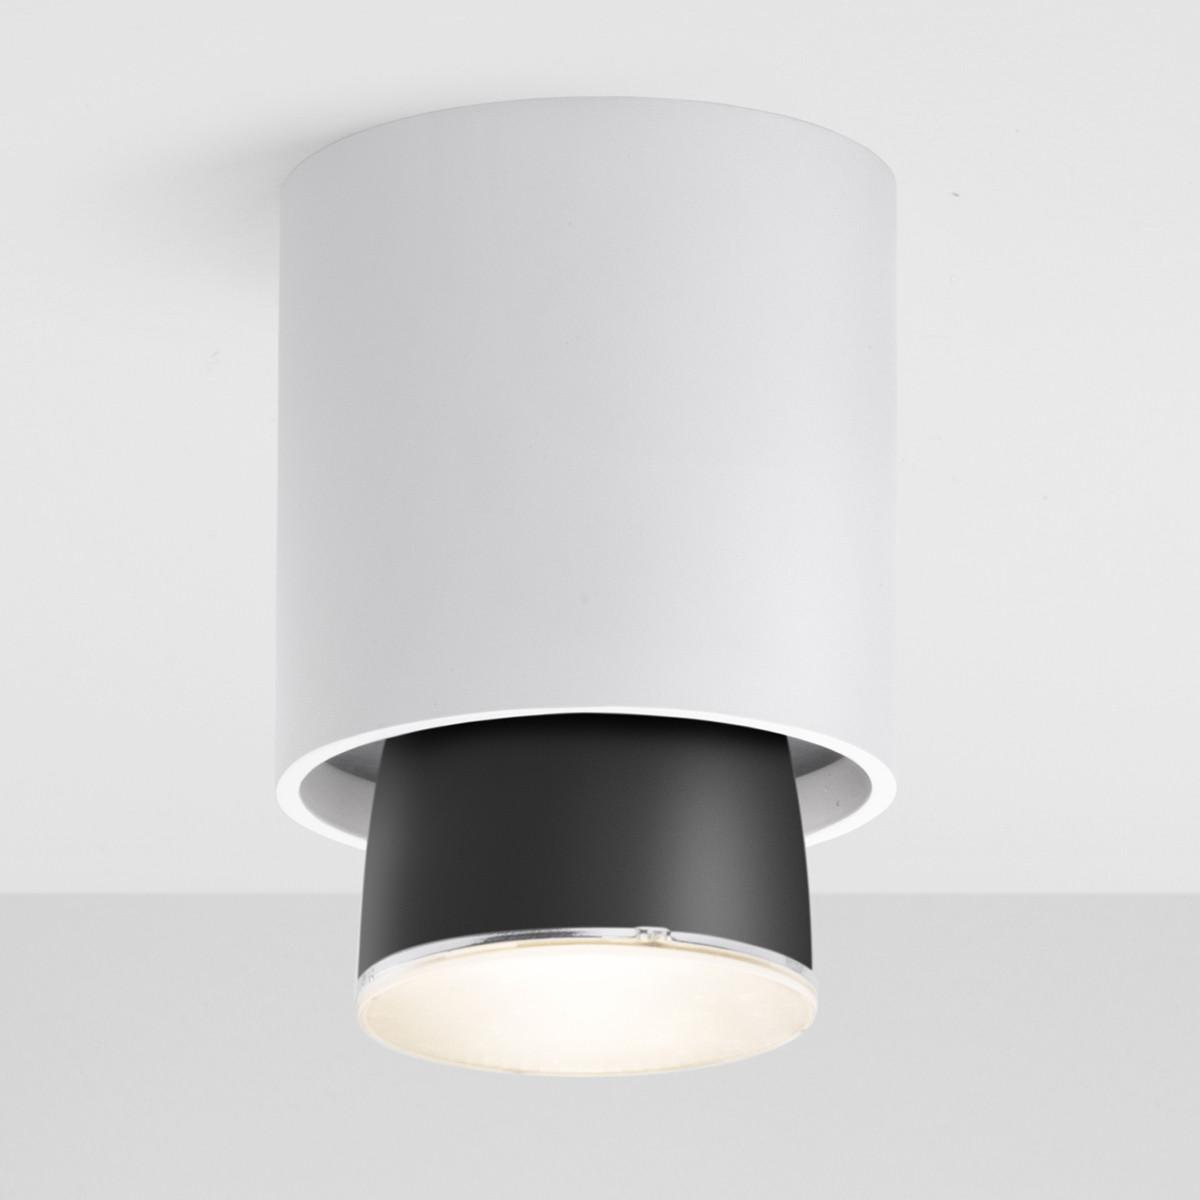 Fabbian claque f43 led deckenleuchte casa de for Skandinavische lampen klassiker